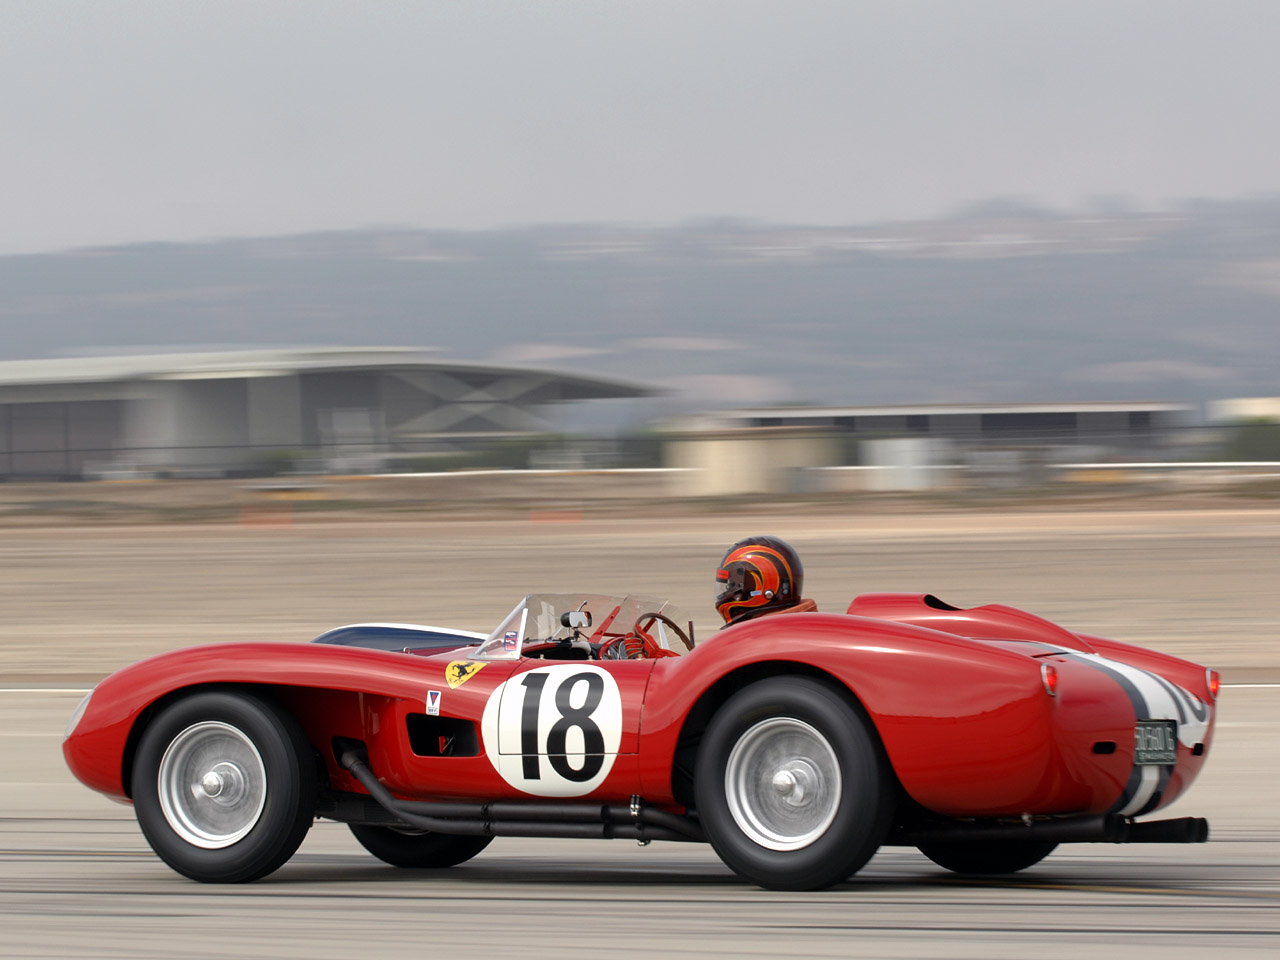 3dtuning of ferrari 250 testa rossa coupe 1957 3dtuning ferrari 250 testa rossa coupe 1957 vanachro Image collections